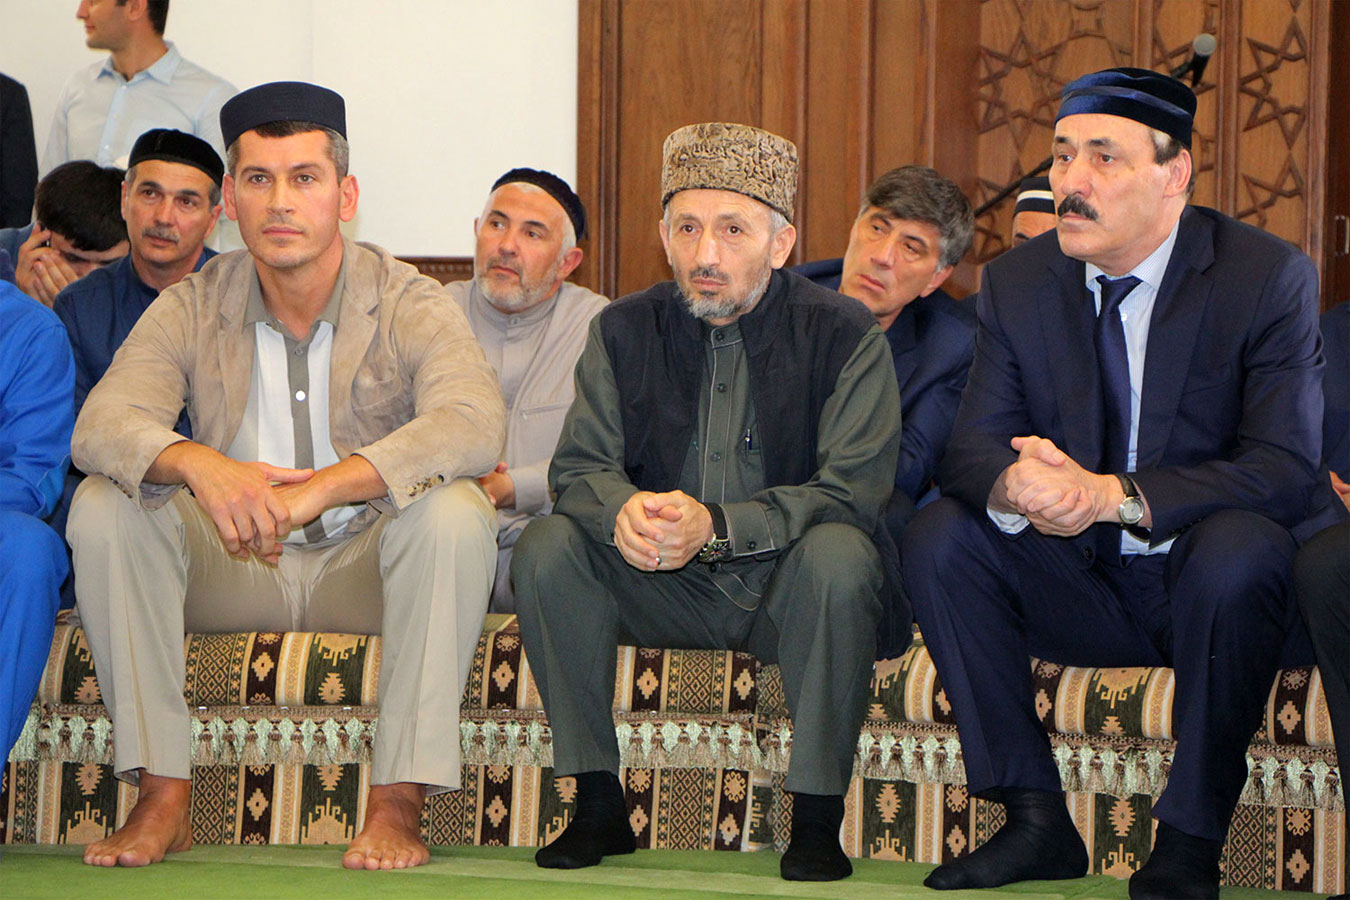 2015 г. З.Магомедов, муфтий А.Абдулаев, глава РД Р.Абдулатипов на открытии мечети в Махачкале. Фото: ИсламДаг